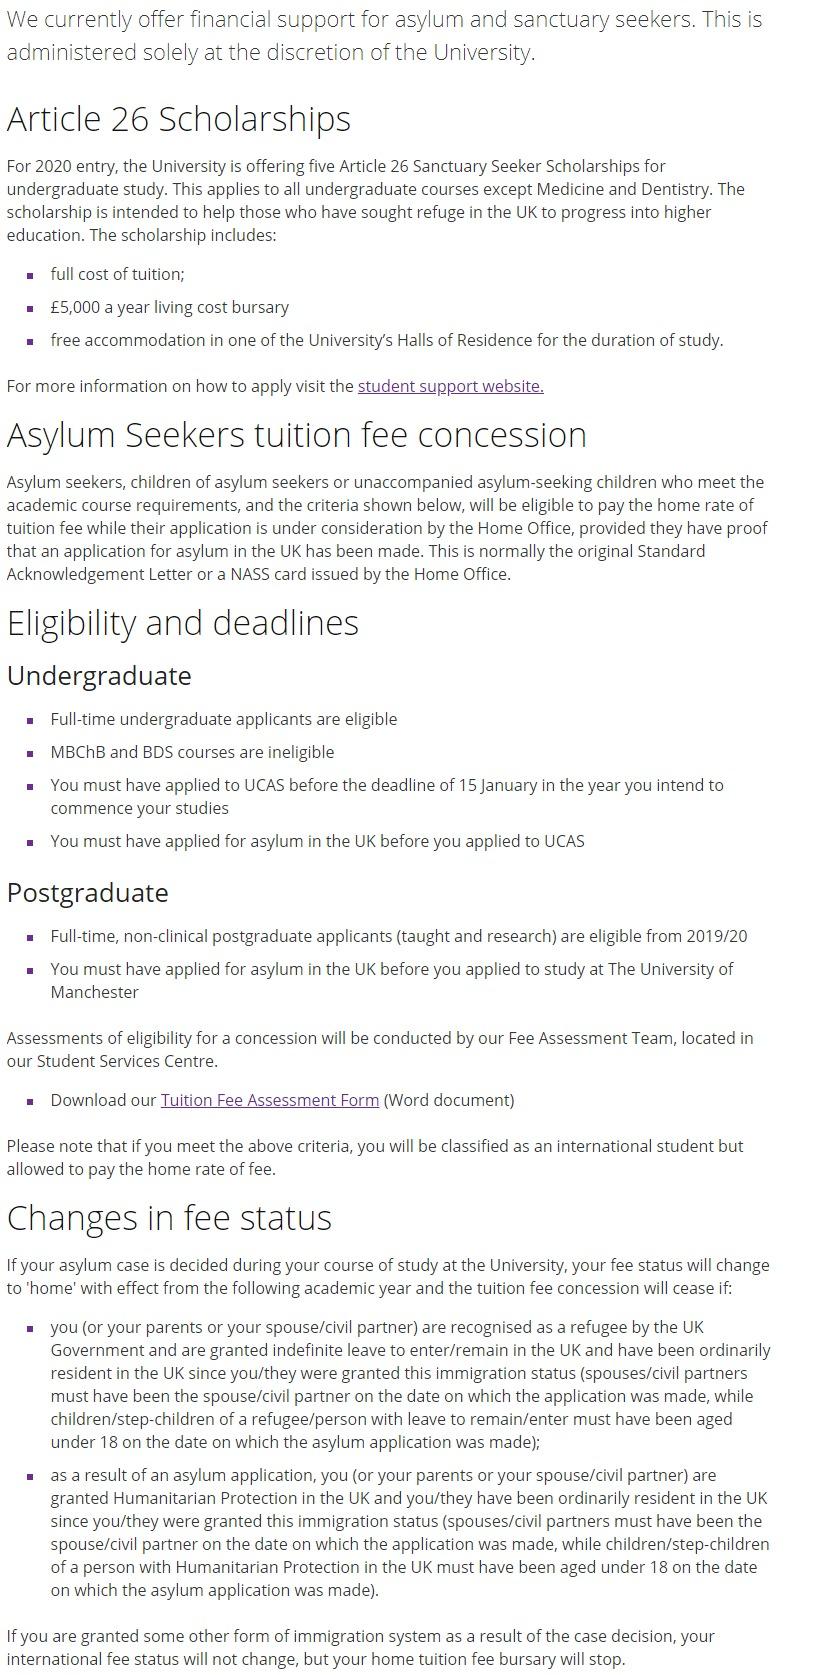 https://ishallwin.com/Content/ScholarshipImages/The-University-of-Manchester.jpg